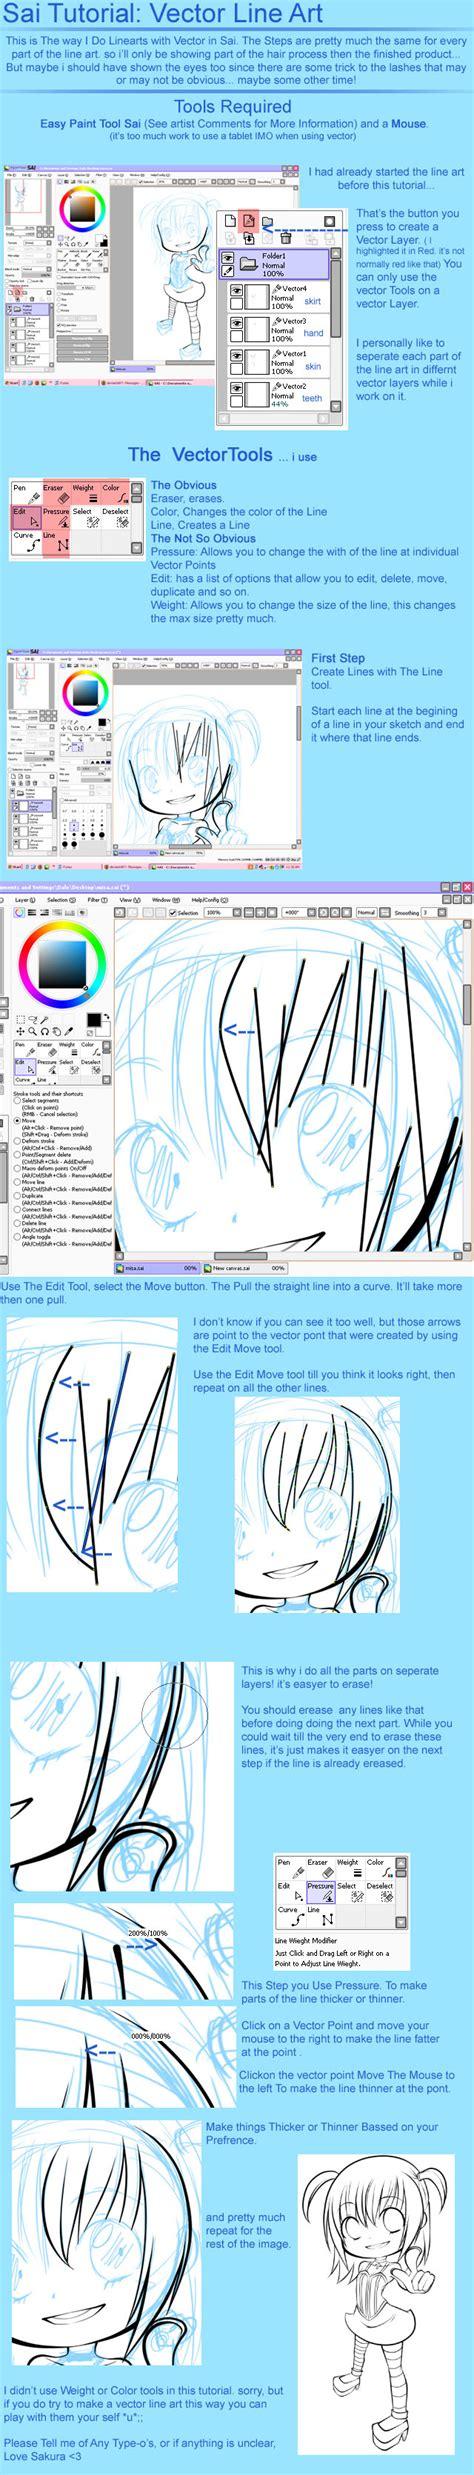 paint tool sai vector layer tutorial sai tutorial vector line by sakurachan776 on deviantart